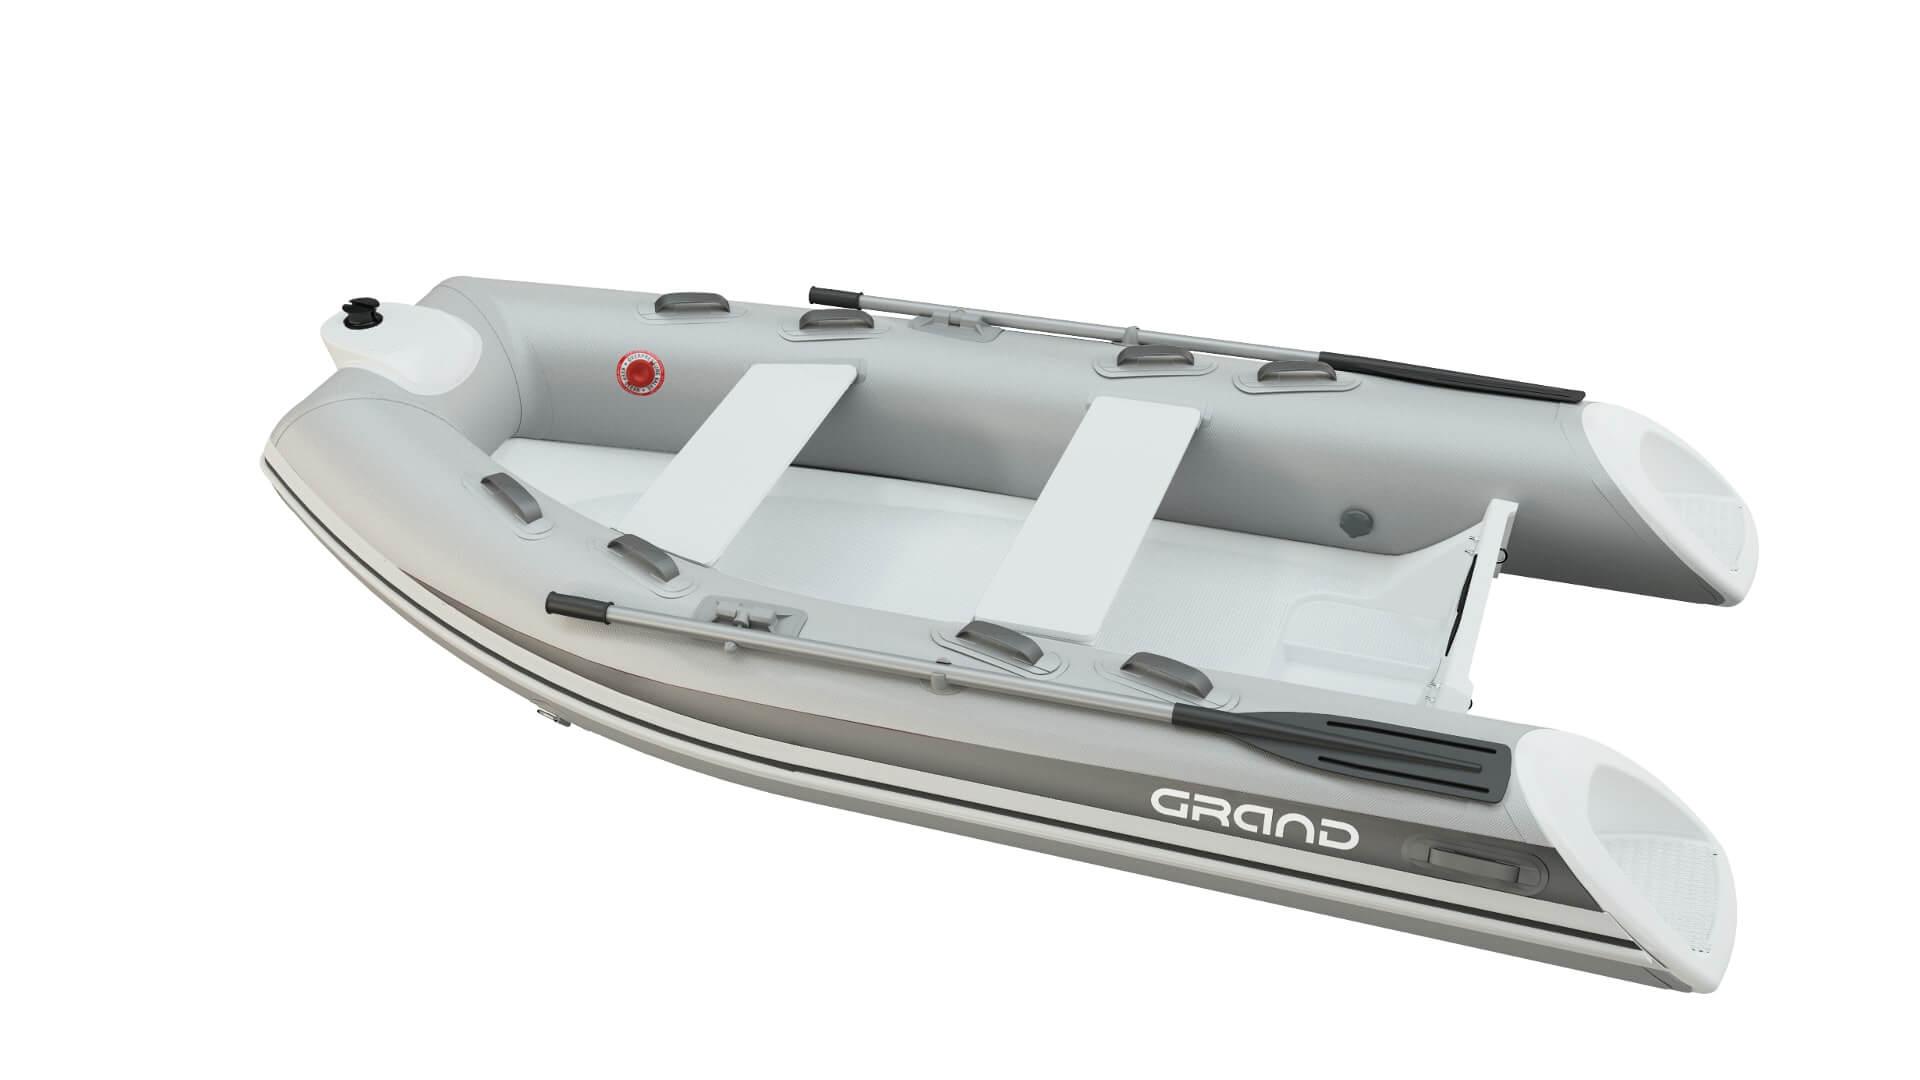 Надувная лодка с жестким дном GRAND Silver Line S330, Надувная лодка GRAND Silver Line S330, GRAND Silver Line S330, GRAND S330, GRAND Silver Line S330F, GRAND S330F,Надувная лодка GRAND, Надувная лодка ГРАНД, Надувная лодка с жестким дном, RIB, Rigid Inflatable Boats